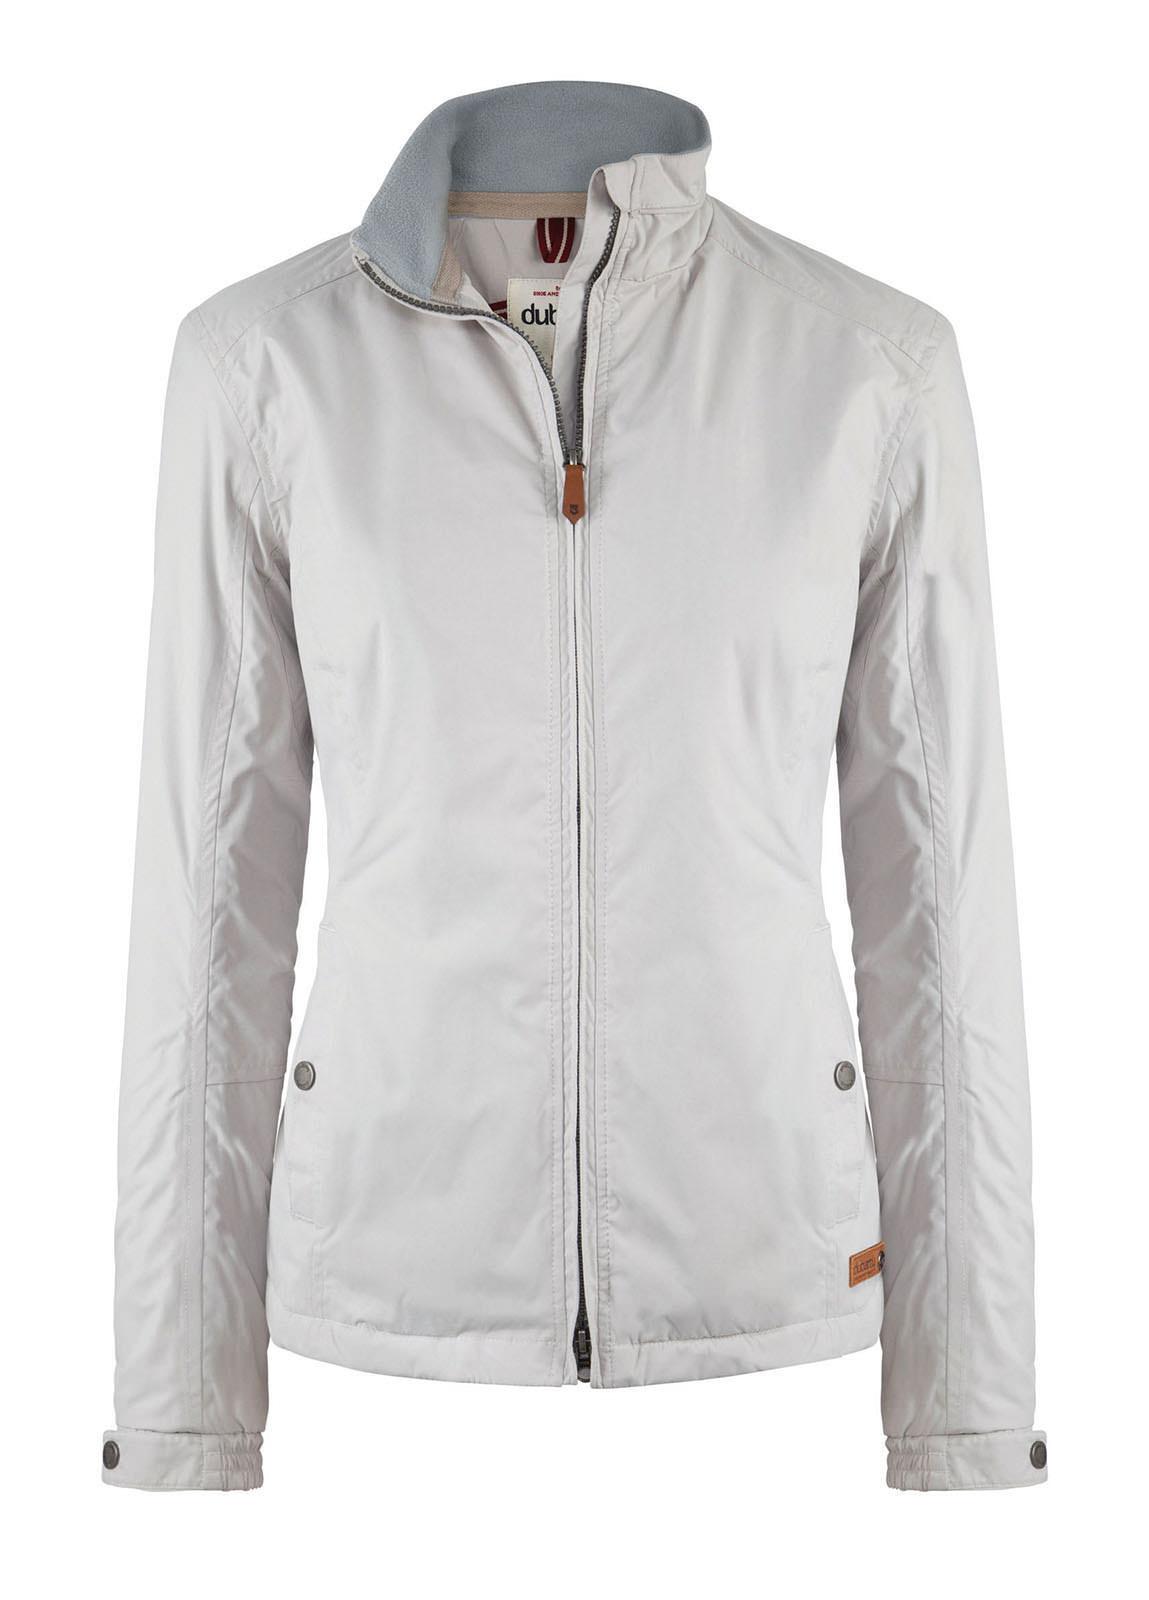 Dubarry_Carlingford Women's Waterproof Jacket - Coral_Image_2